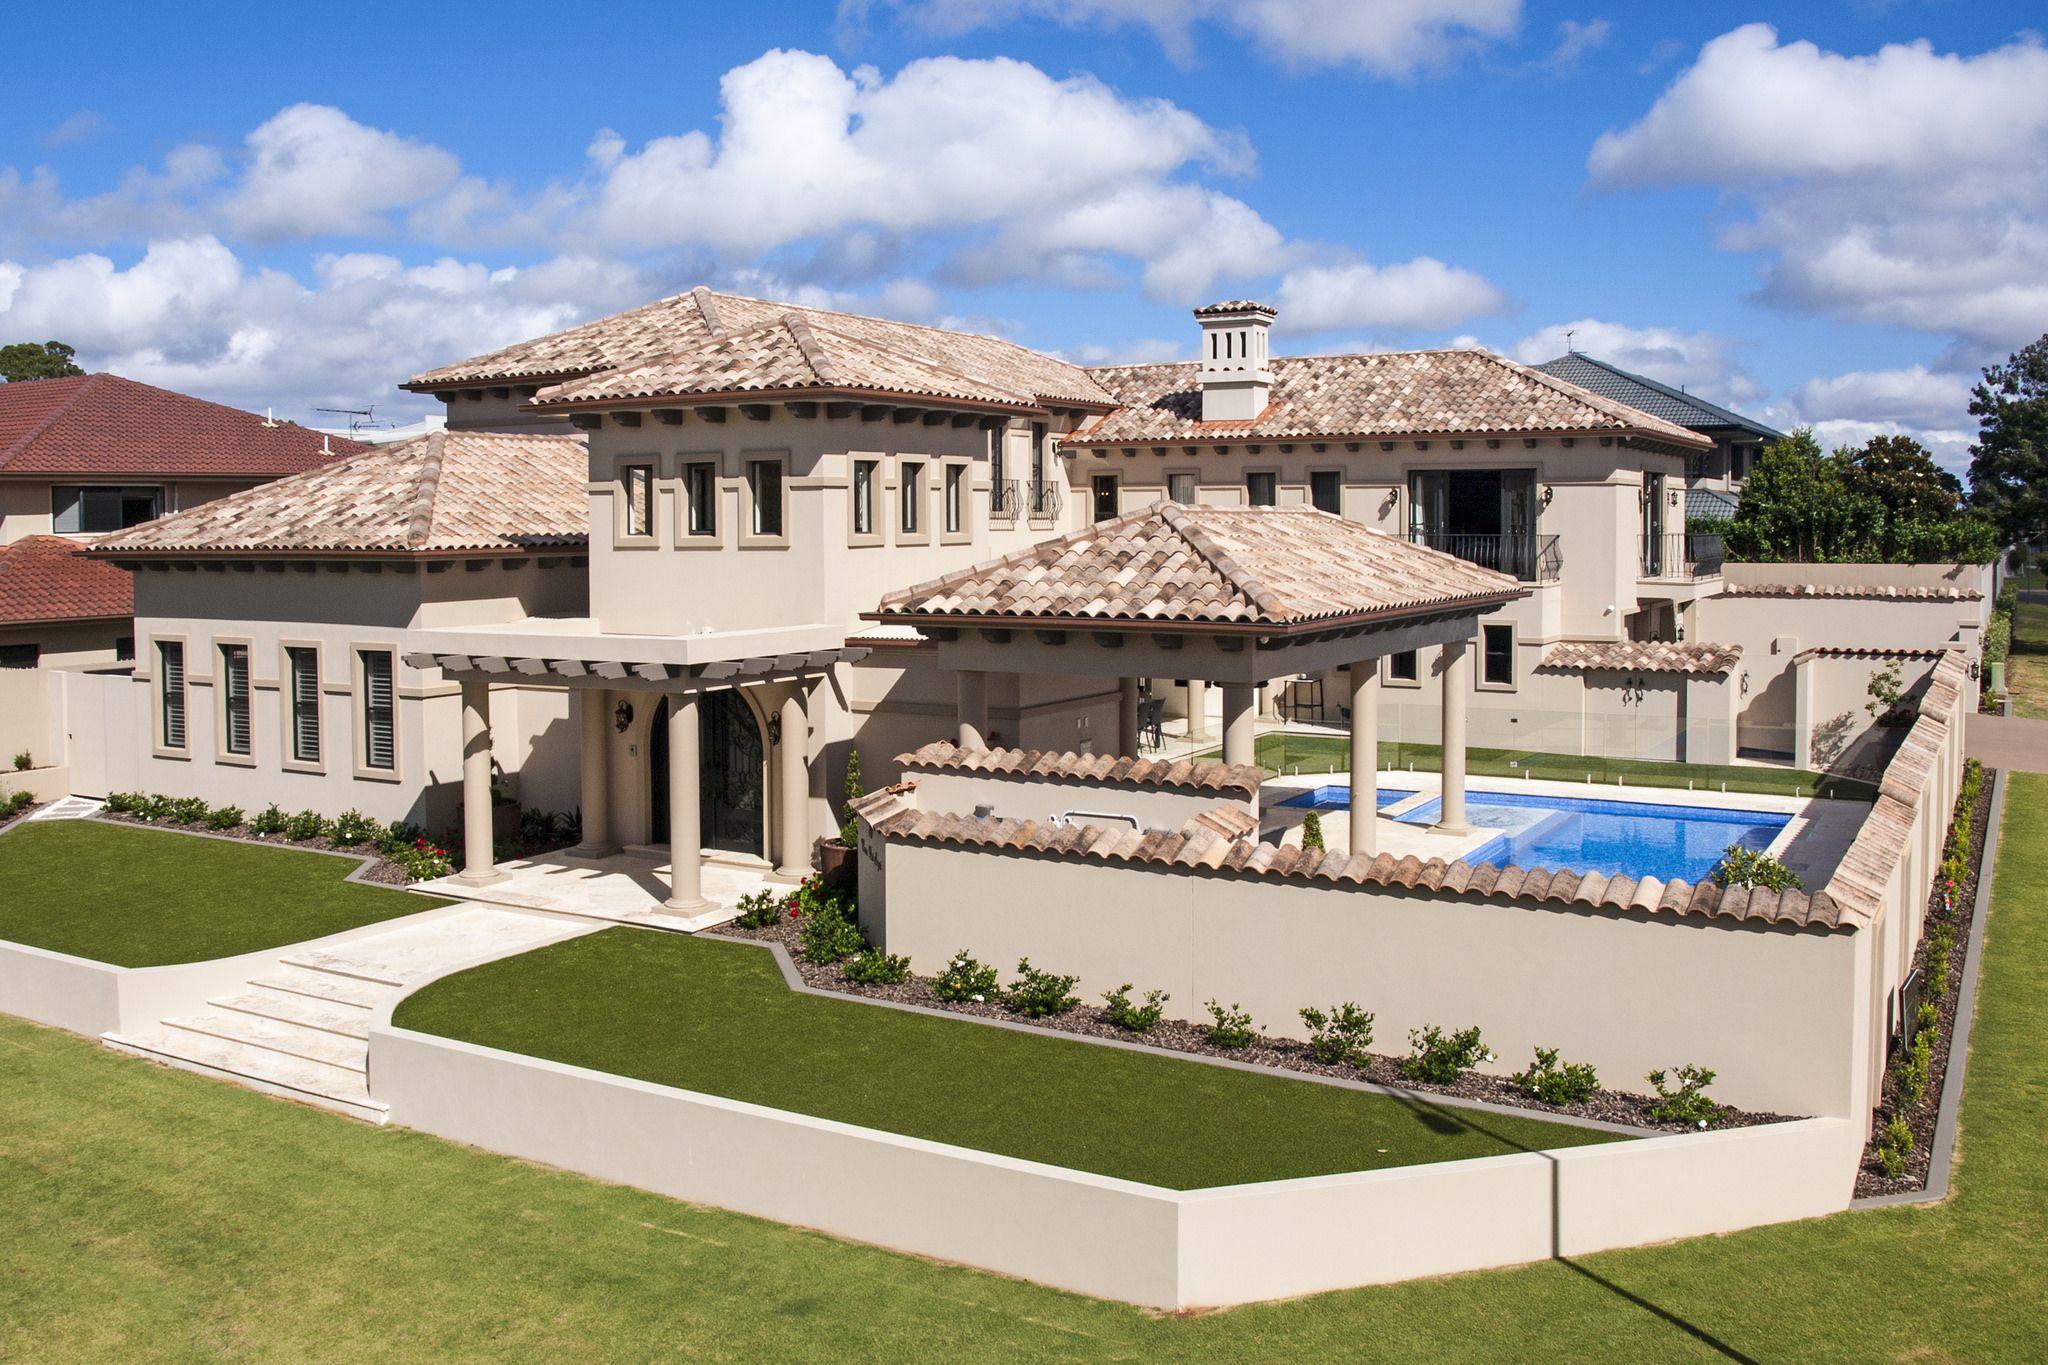 La Escandella Curvado In Aitana And Lucentum Old Villa Style Roof Tiles House Styles